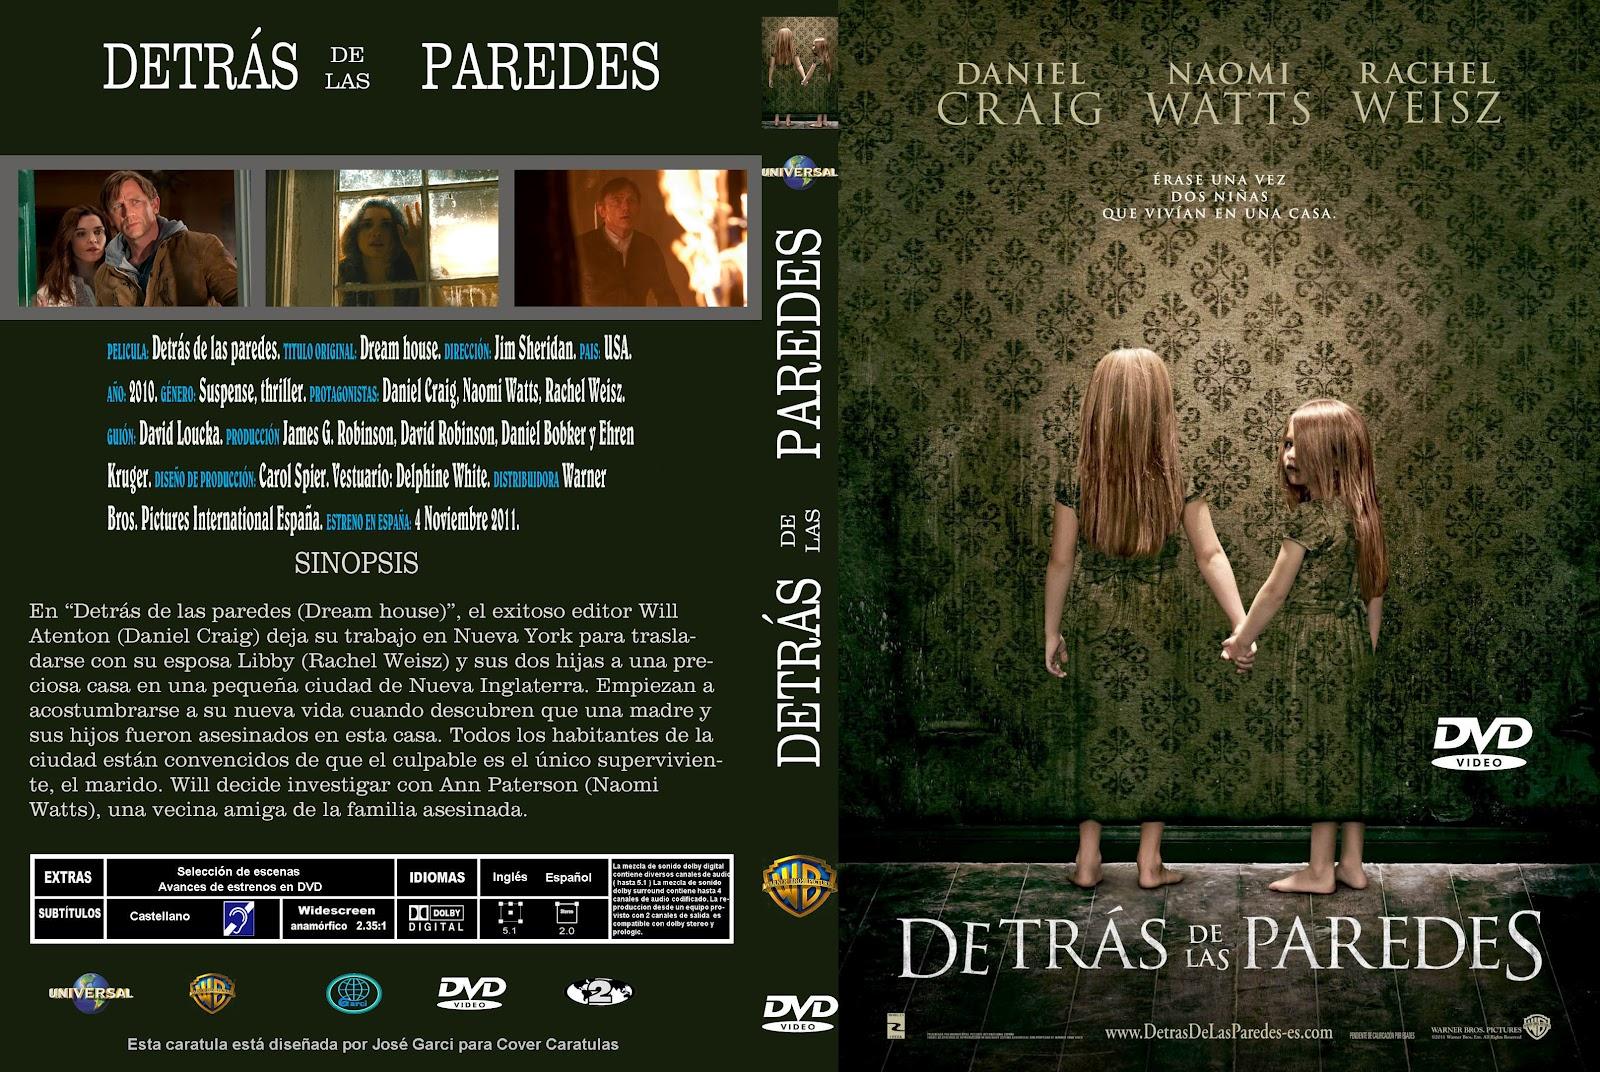 http://4.bp.blogspot.com/-71F7UXhnU3E/TzMshFlGaHI/AAAAAAAABwg/unYNTGK4Ft8/s1600/Detras+De+Las+Paredes+Custom+Por+Josegarci+-+dvd.jpg